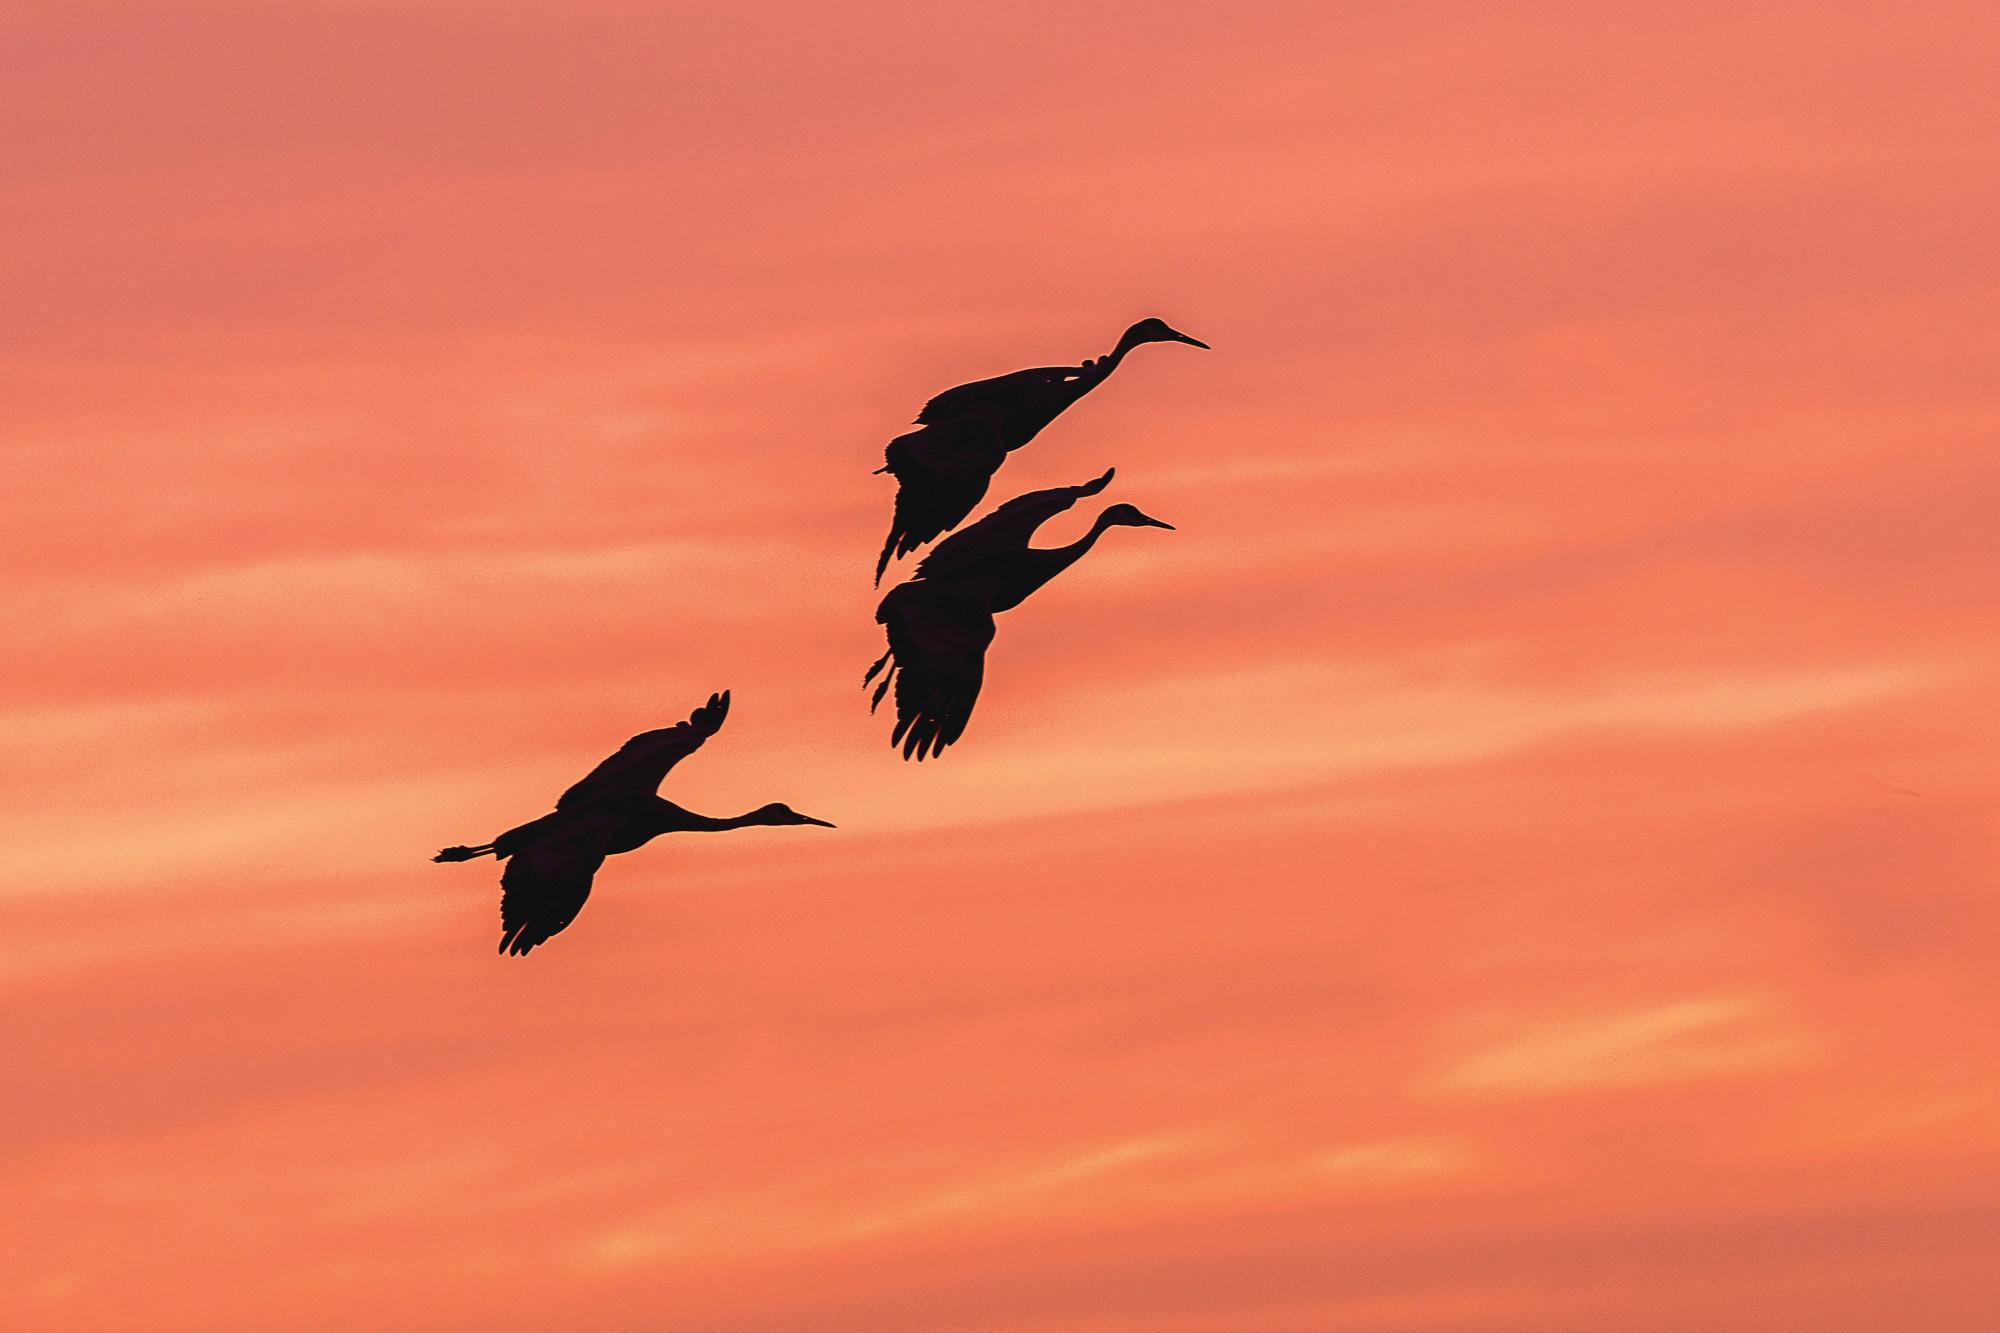 Second place, Bosque Cranes by Tom Cadwalader